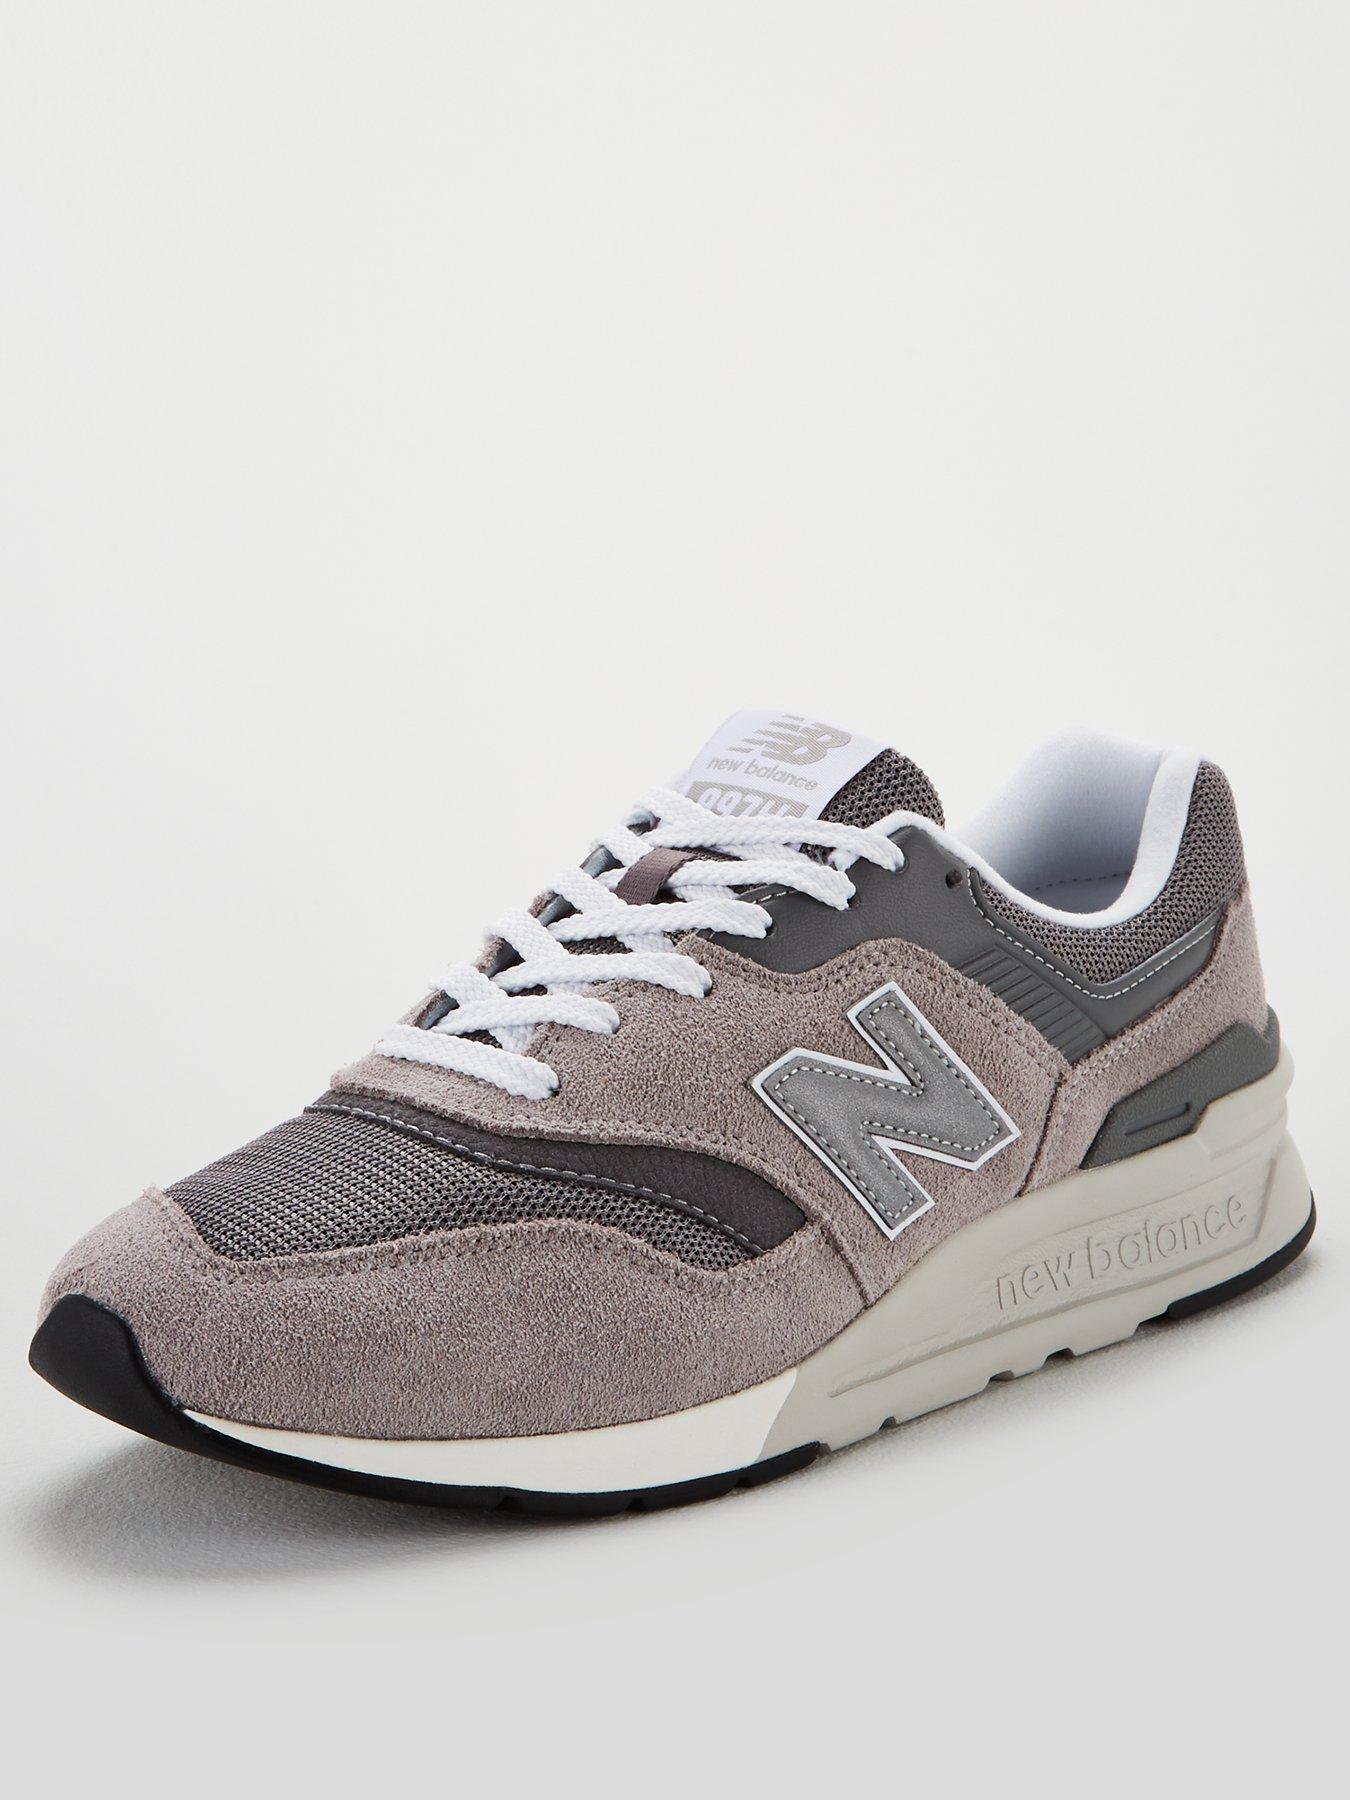 new balance 997h uk